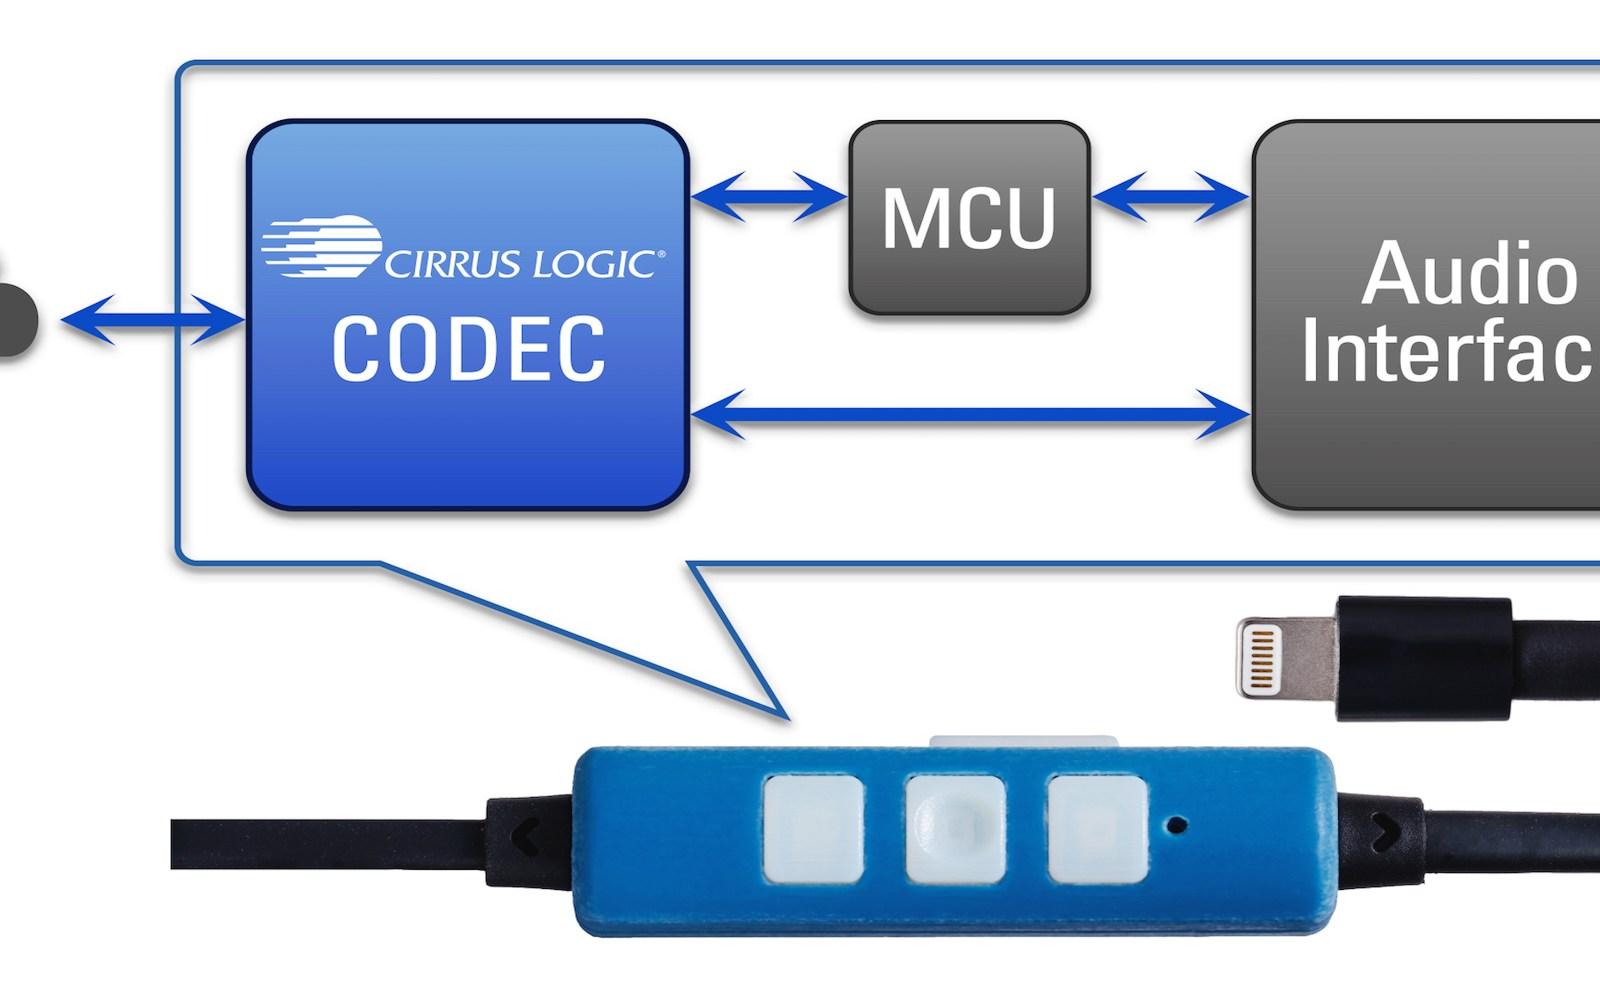 Cirrus Logic announces dev kit for building Apple's MFi Lightning headphones ahead of iPhone 7